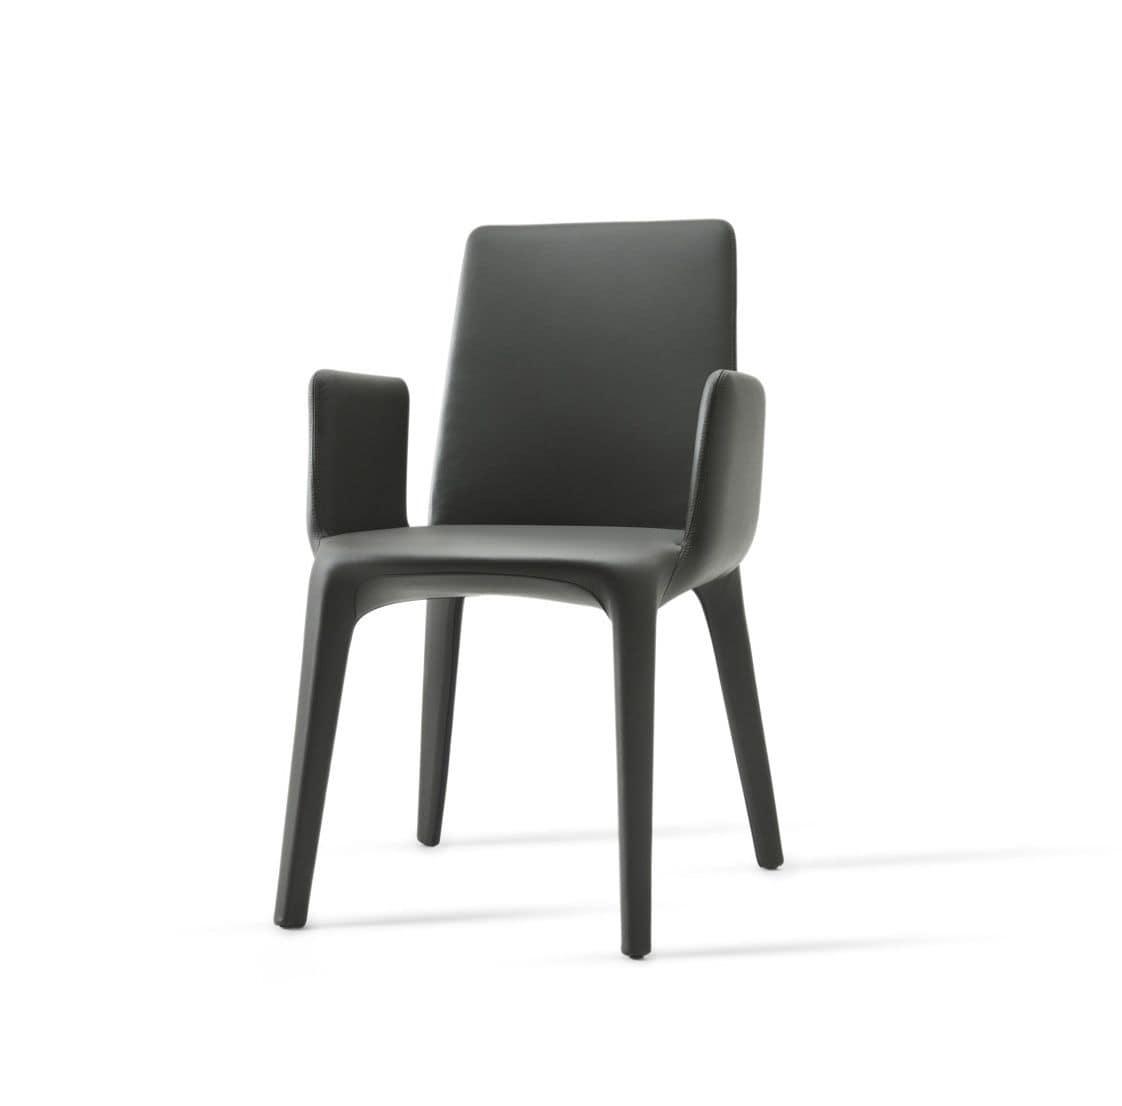 karma armchair poltroncine moderne interamente rivestite